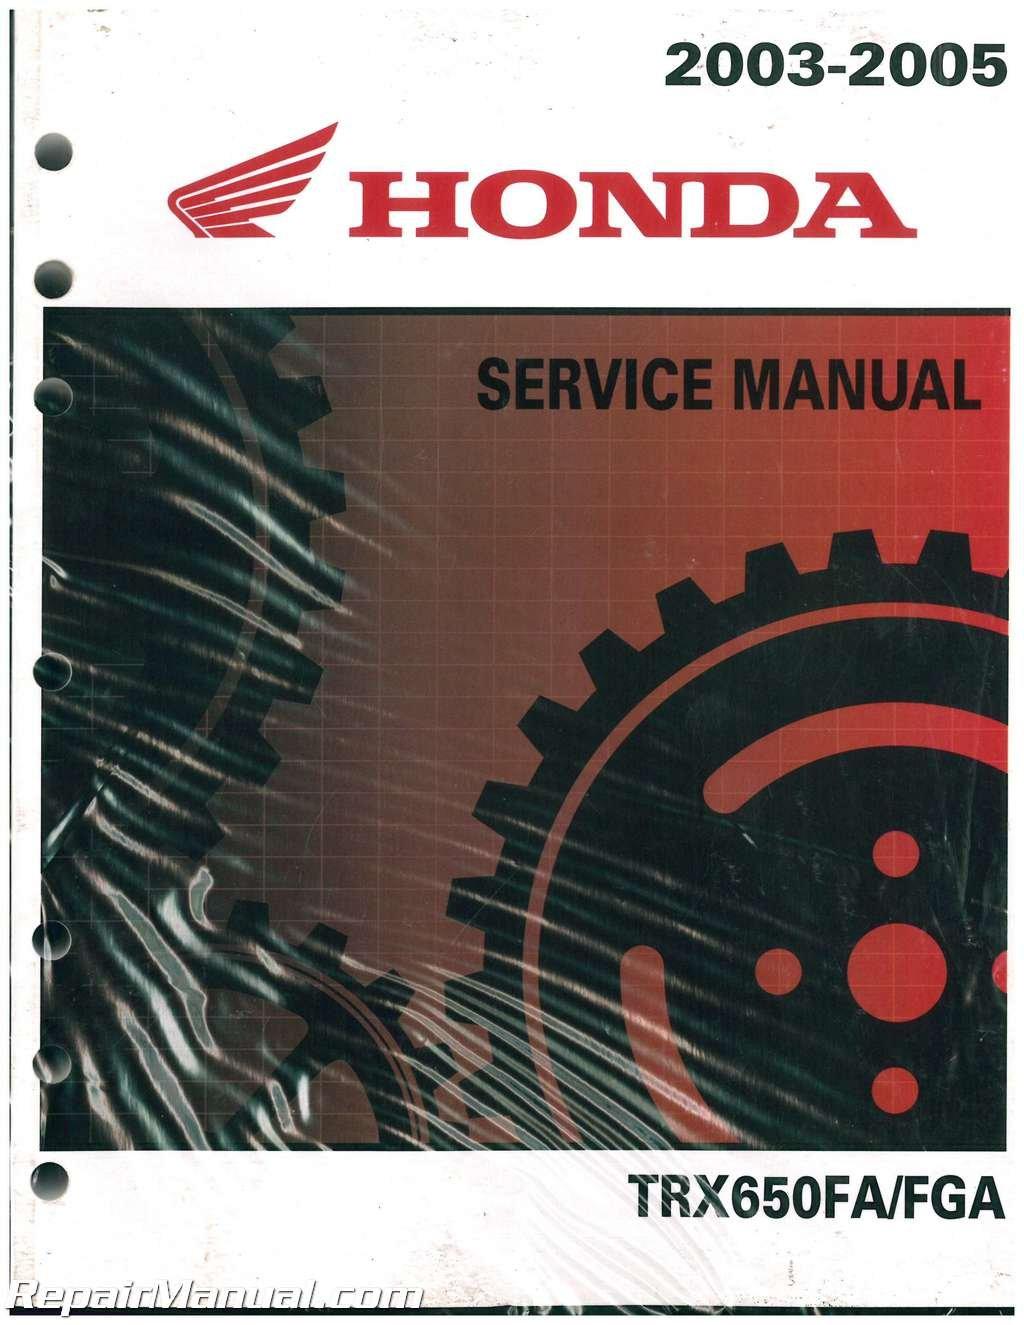 61HN802 2003 2004 2005 Honda TRX650 Rincon ATV Service Manual ... on yamaha blaster wiring diagram, kawasaki brute force wiring diagram, yamaha wolverine wiring diagram, honda rincon carburetor, buick reatta wiring diagram, polaris sportsman wiring diagram, honda rincon lights, honda rincon transmission diagram, honda rincon rear suspension, honda rincon exhaust, honda rincon tires, grizzly 660 wiring diagram, honda rincon engine, honda rincon power steering, honda rincon parts list, yamaha rhino wiring diagram, honda rincon ignition coil, honda rincon spark plug, honda trx450r wiring-diagram, hyundai xg350 wiring diagram,